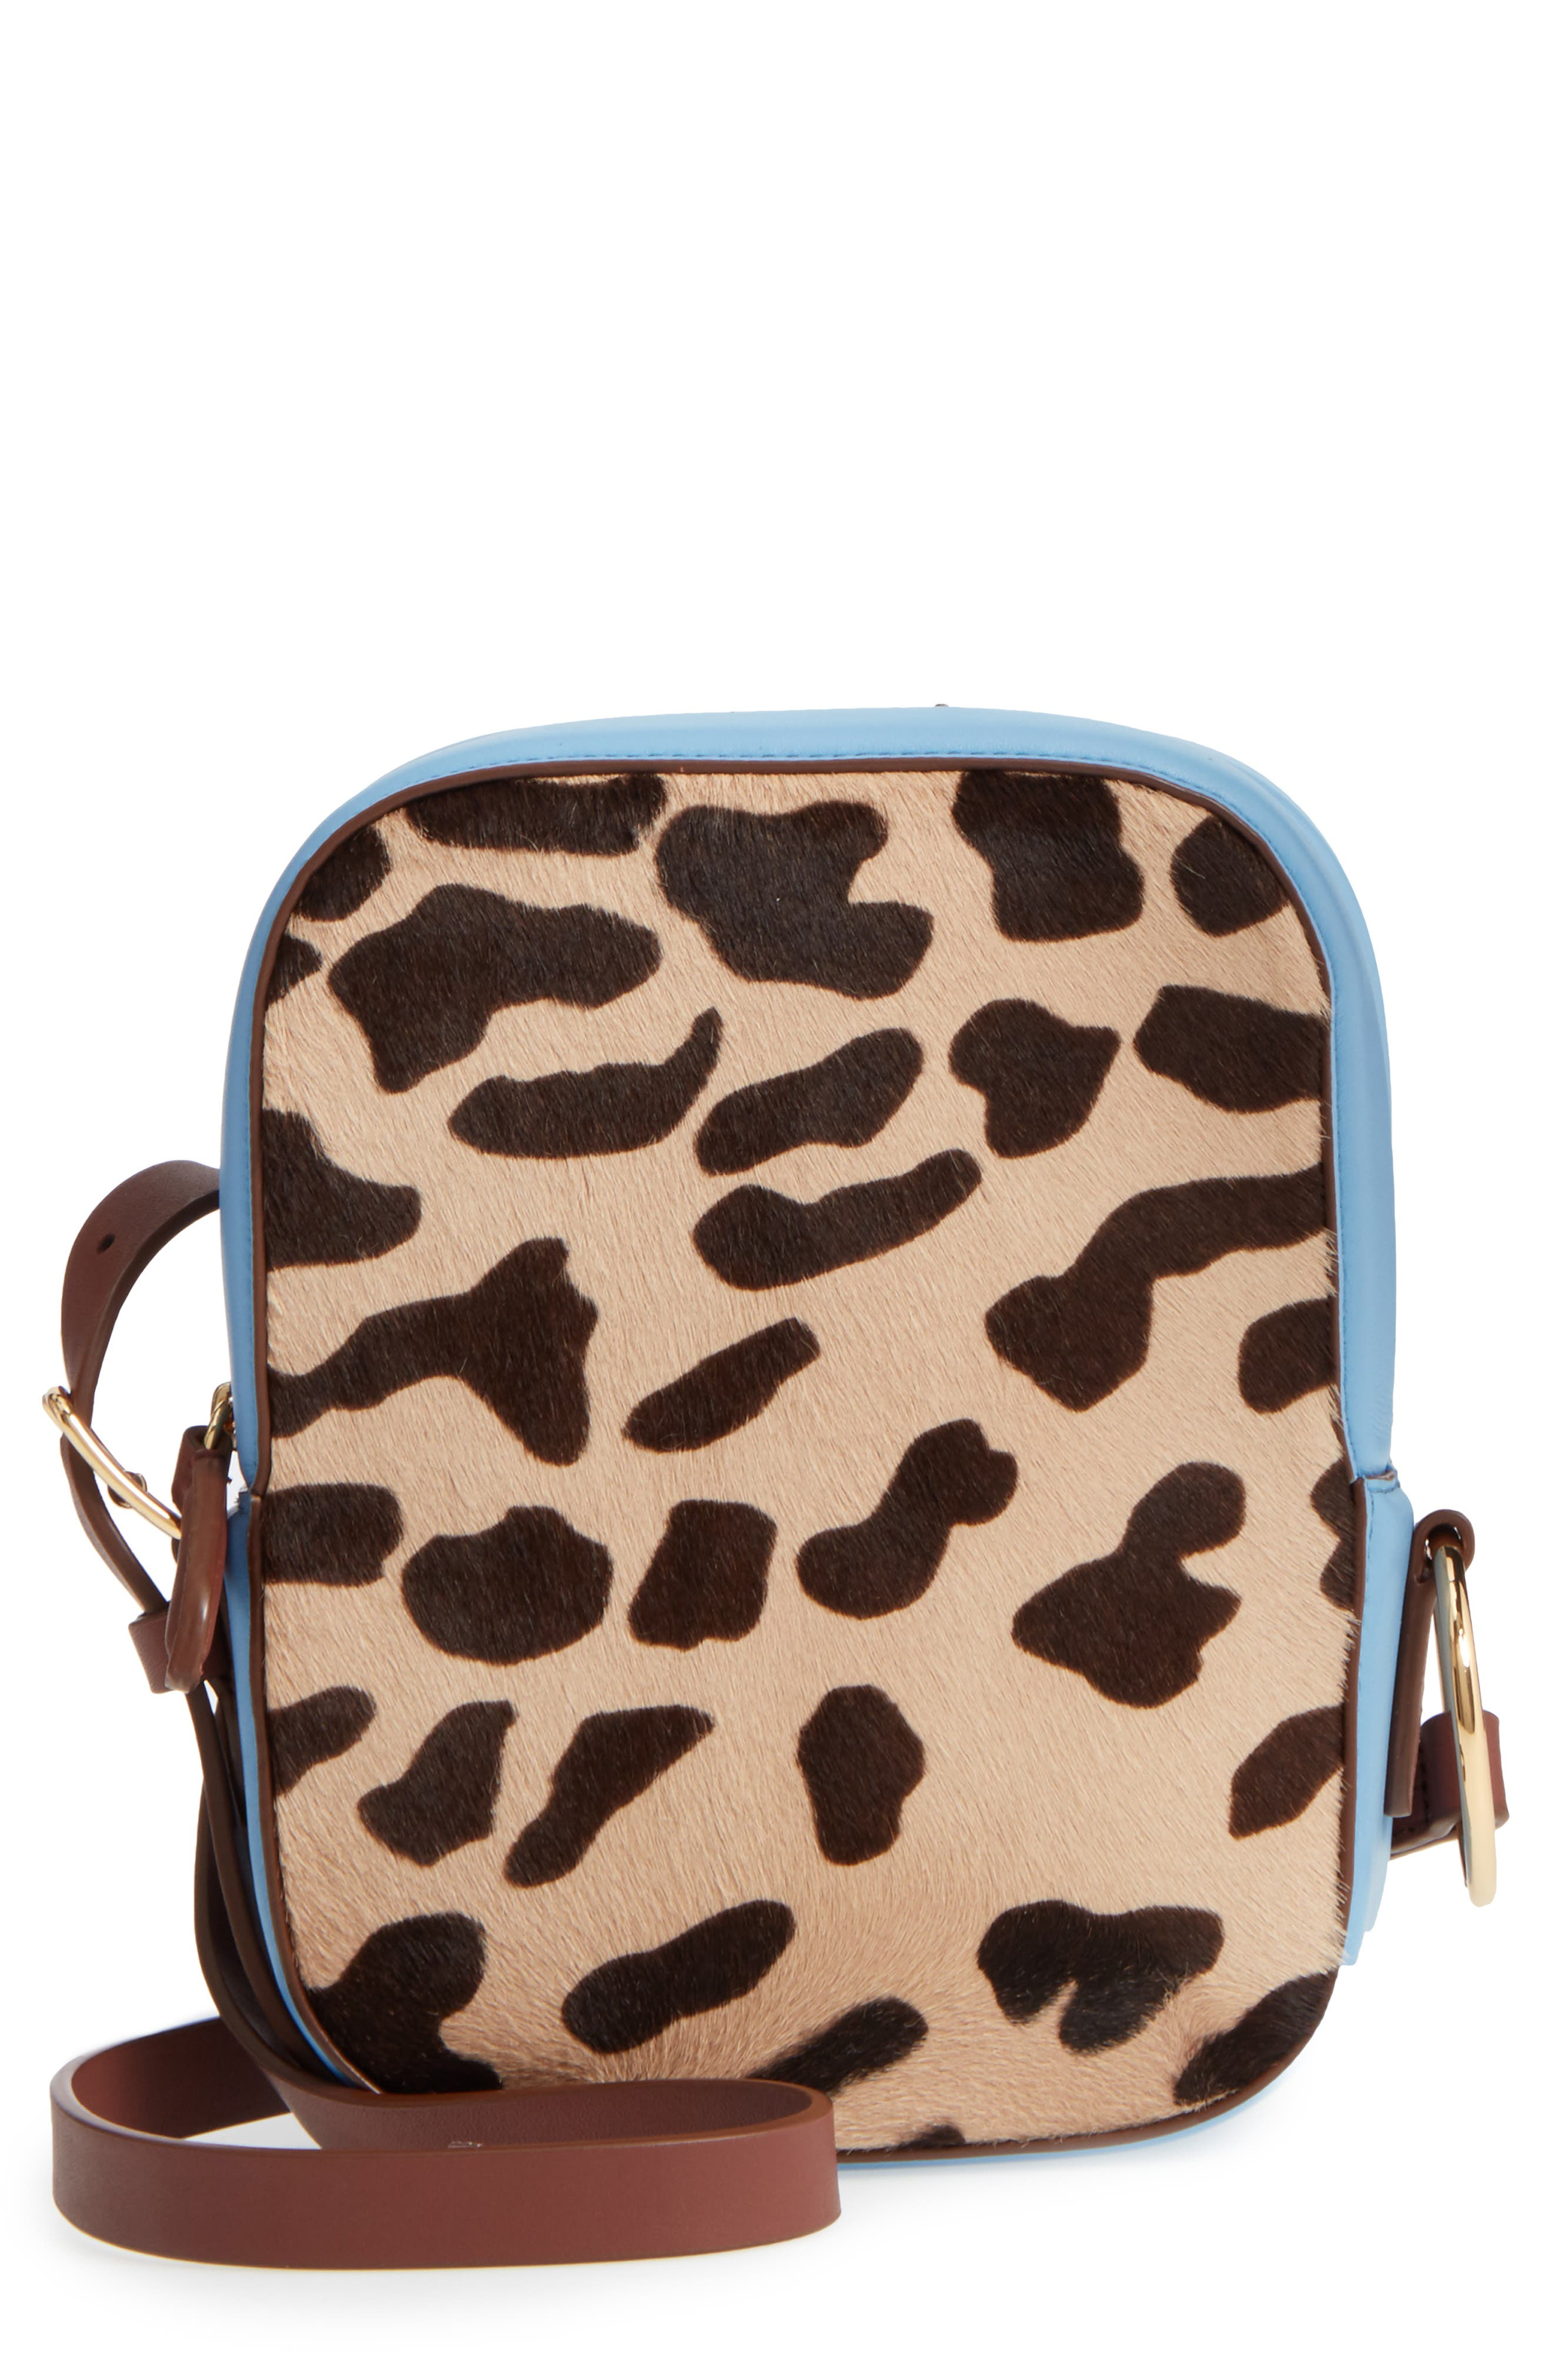 Leather & Genuine Calf Hair Camera Bag,                             Main thumbnail 1, color,                             Leopard/ Powder Blue